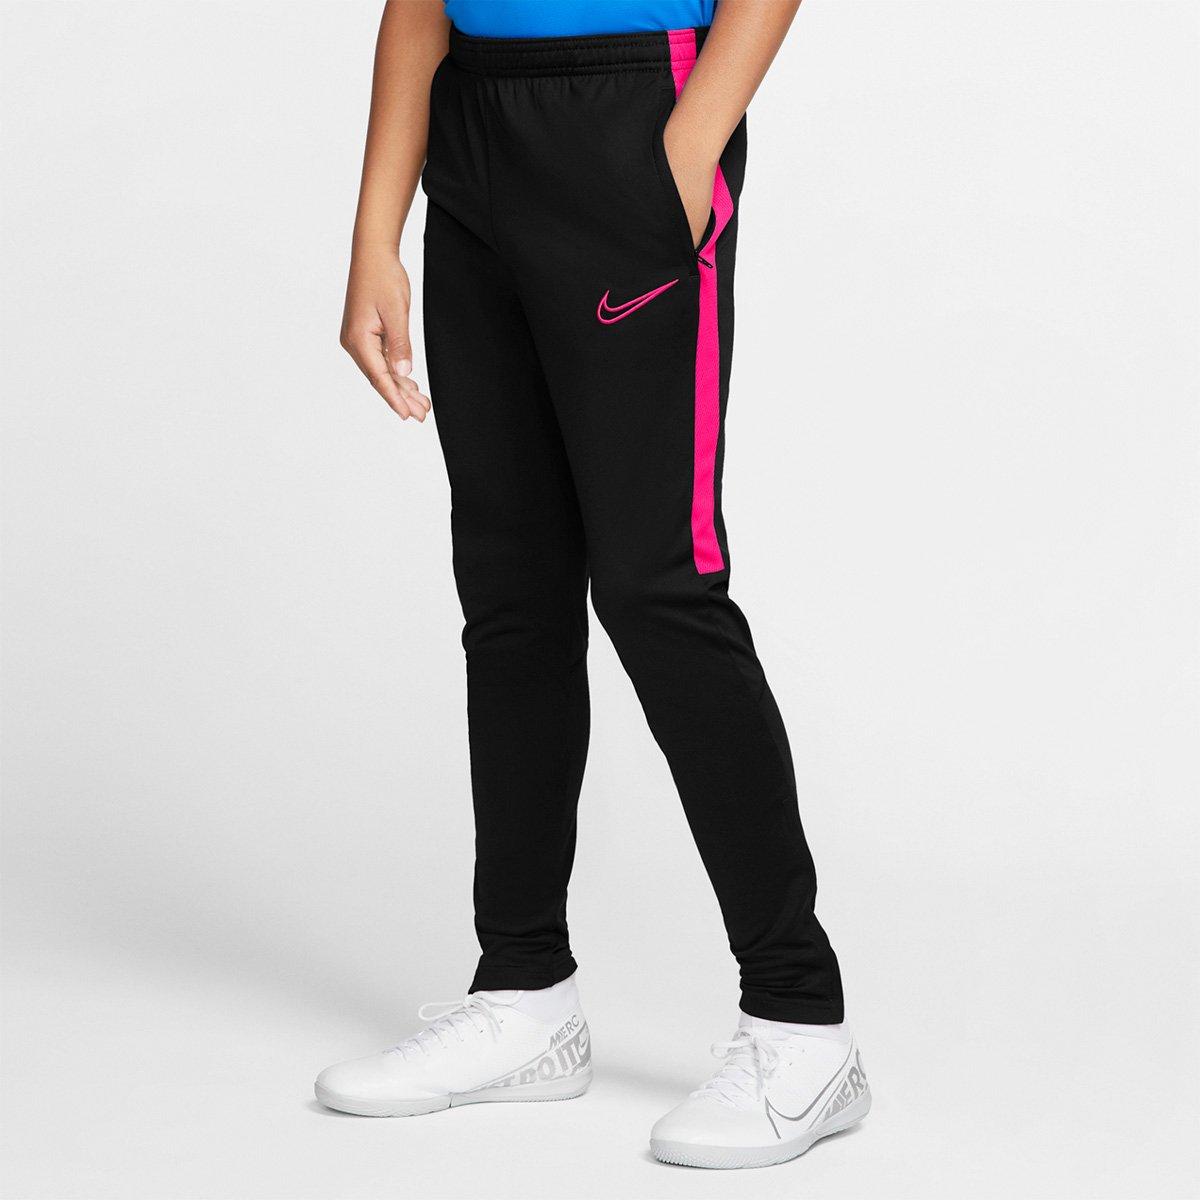 Calça Infantil Nike Academy Dry Fit KPZ